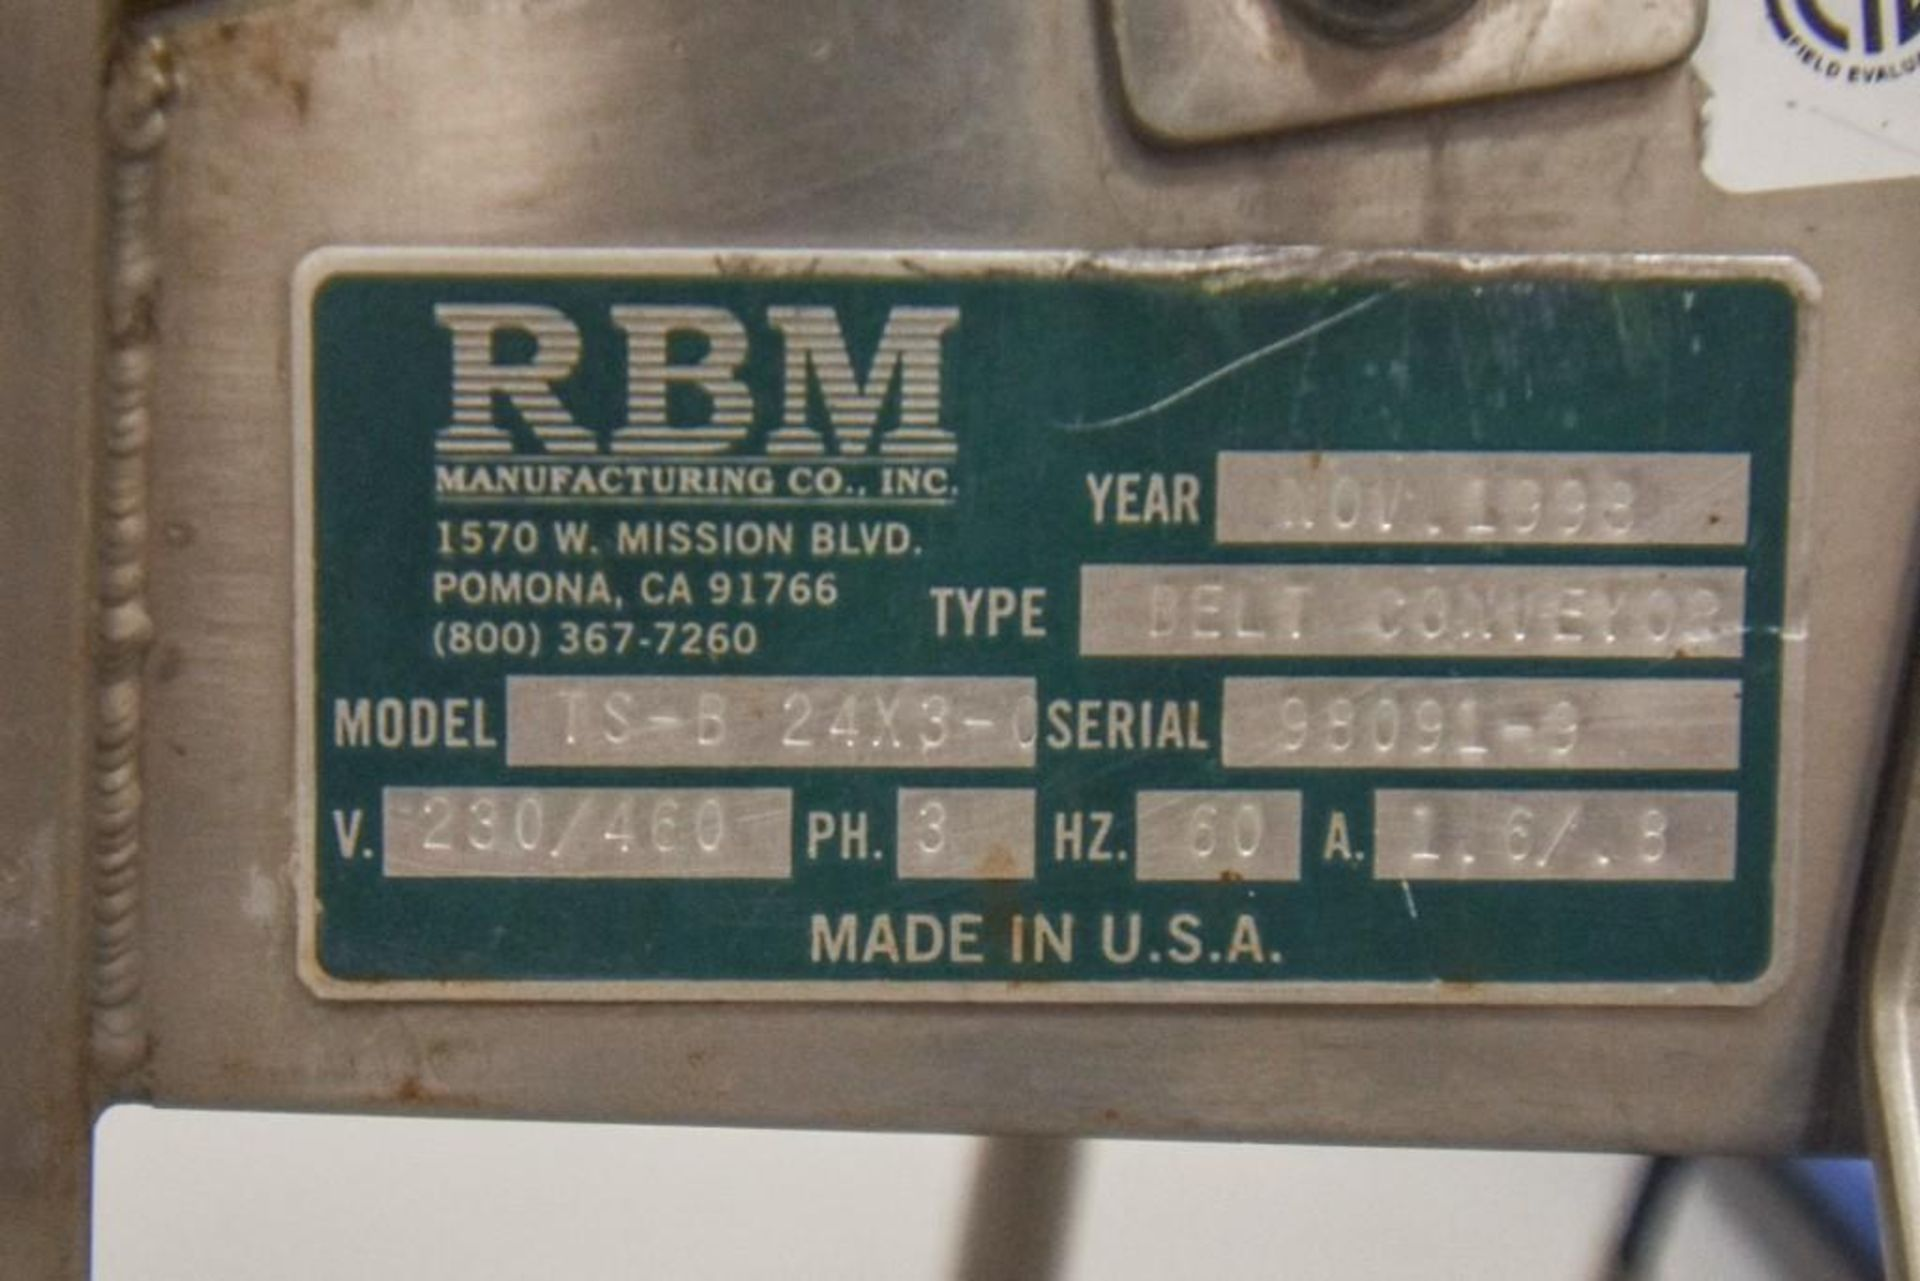 RBM Vibratory Deck With Food Grade Conveyor TS-B 24X3-0 - Image 7 of 7